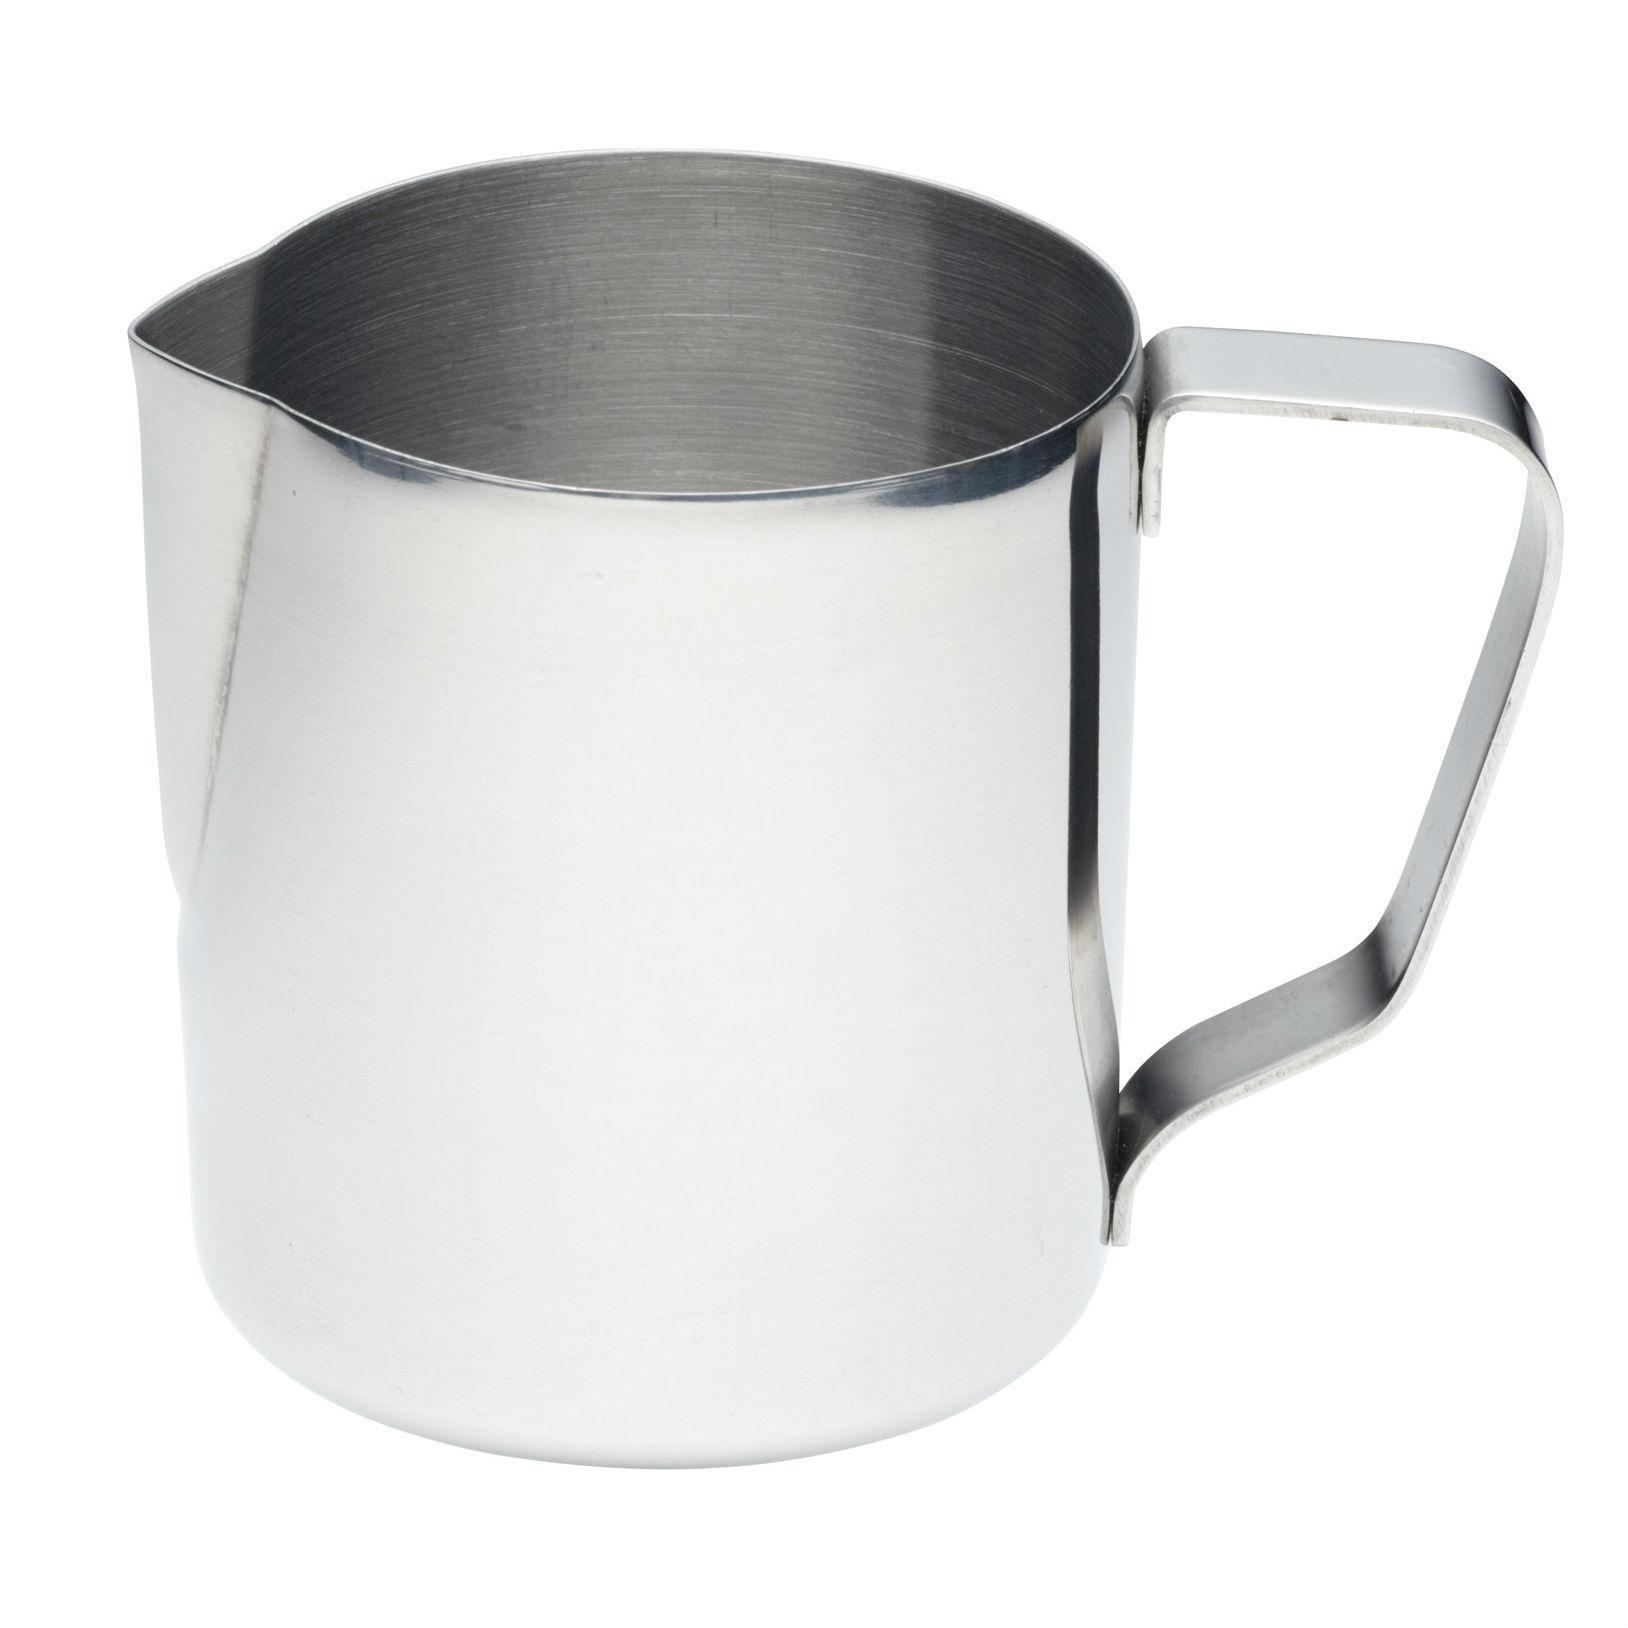 kitchencraft medium stainless steel milk jug  frothing jug   - view larger